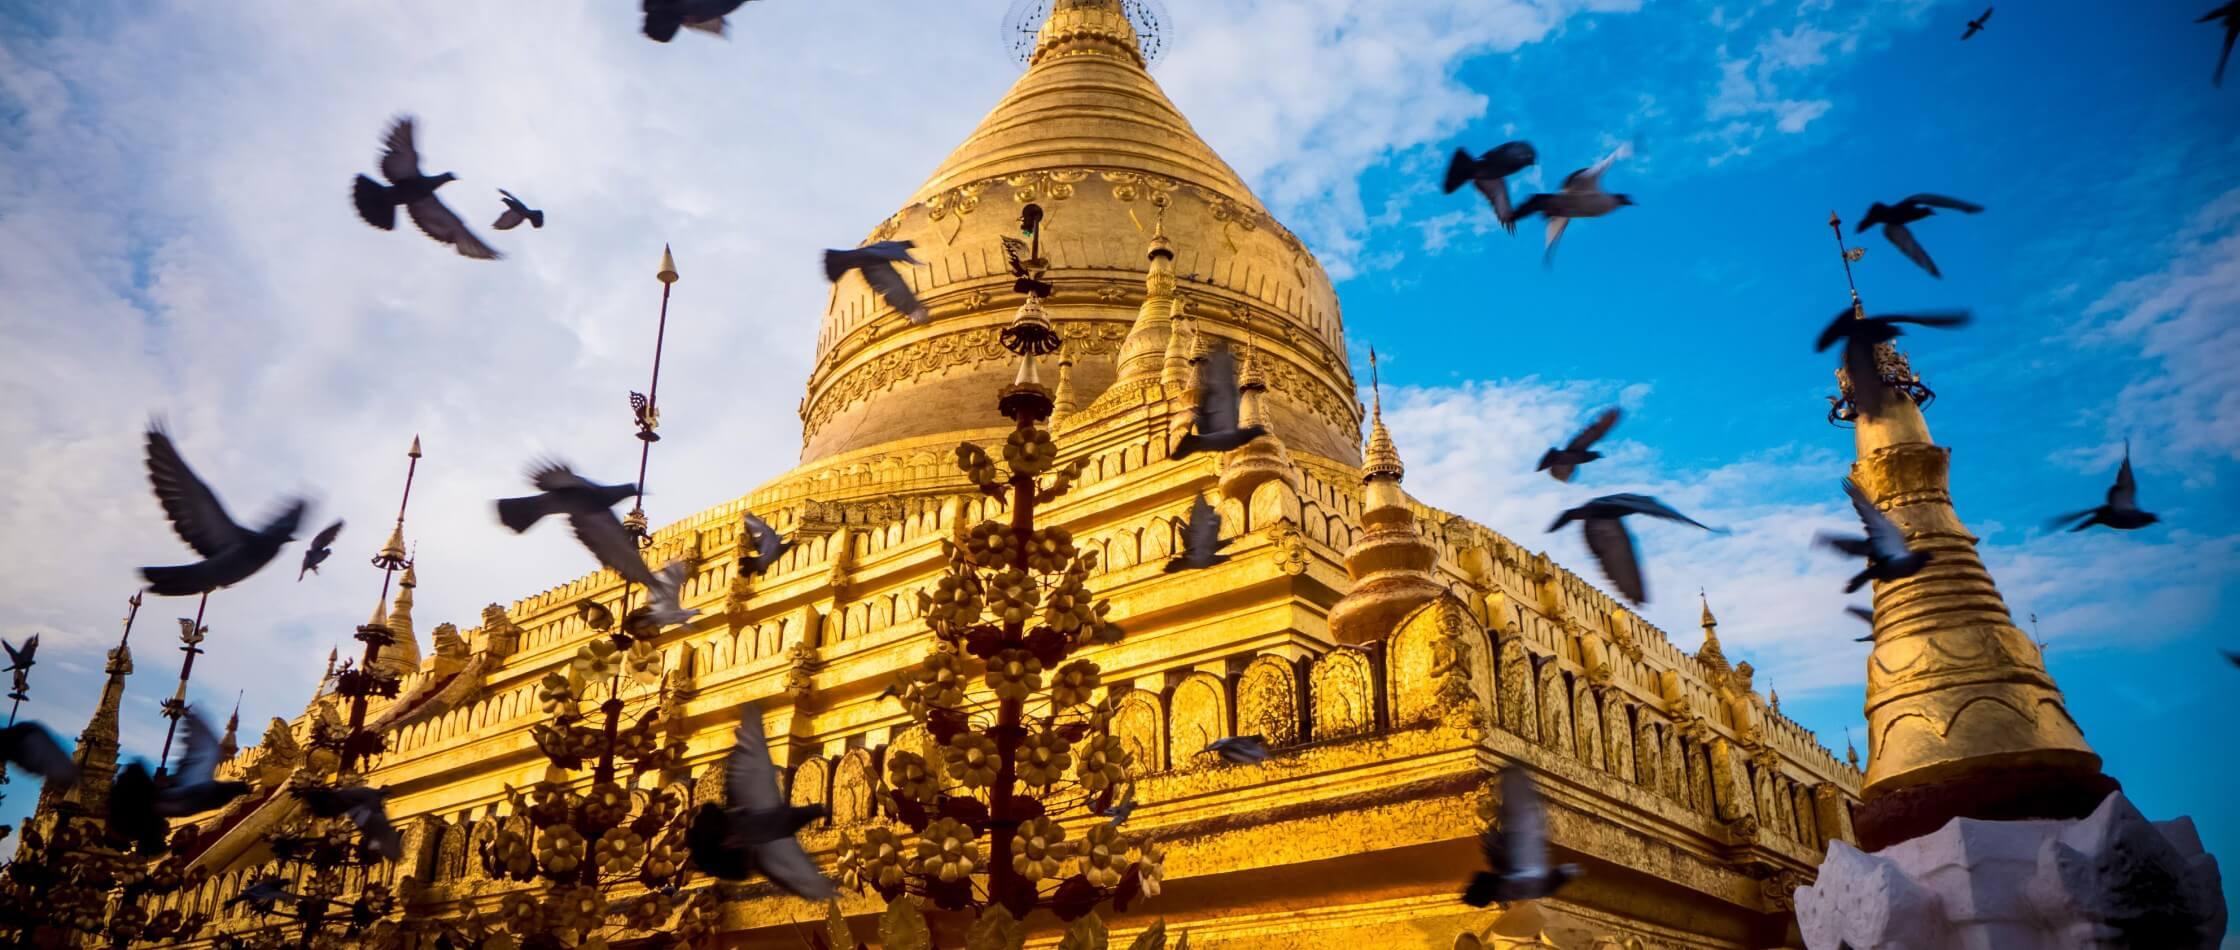 shwezigon pagoda 5